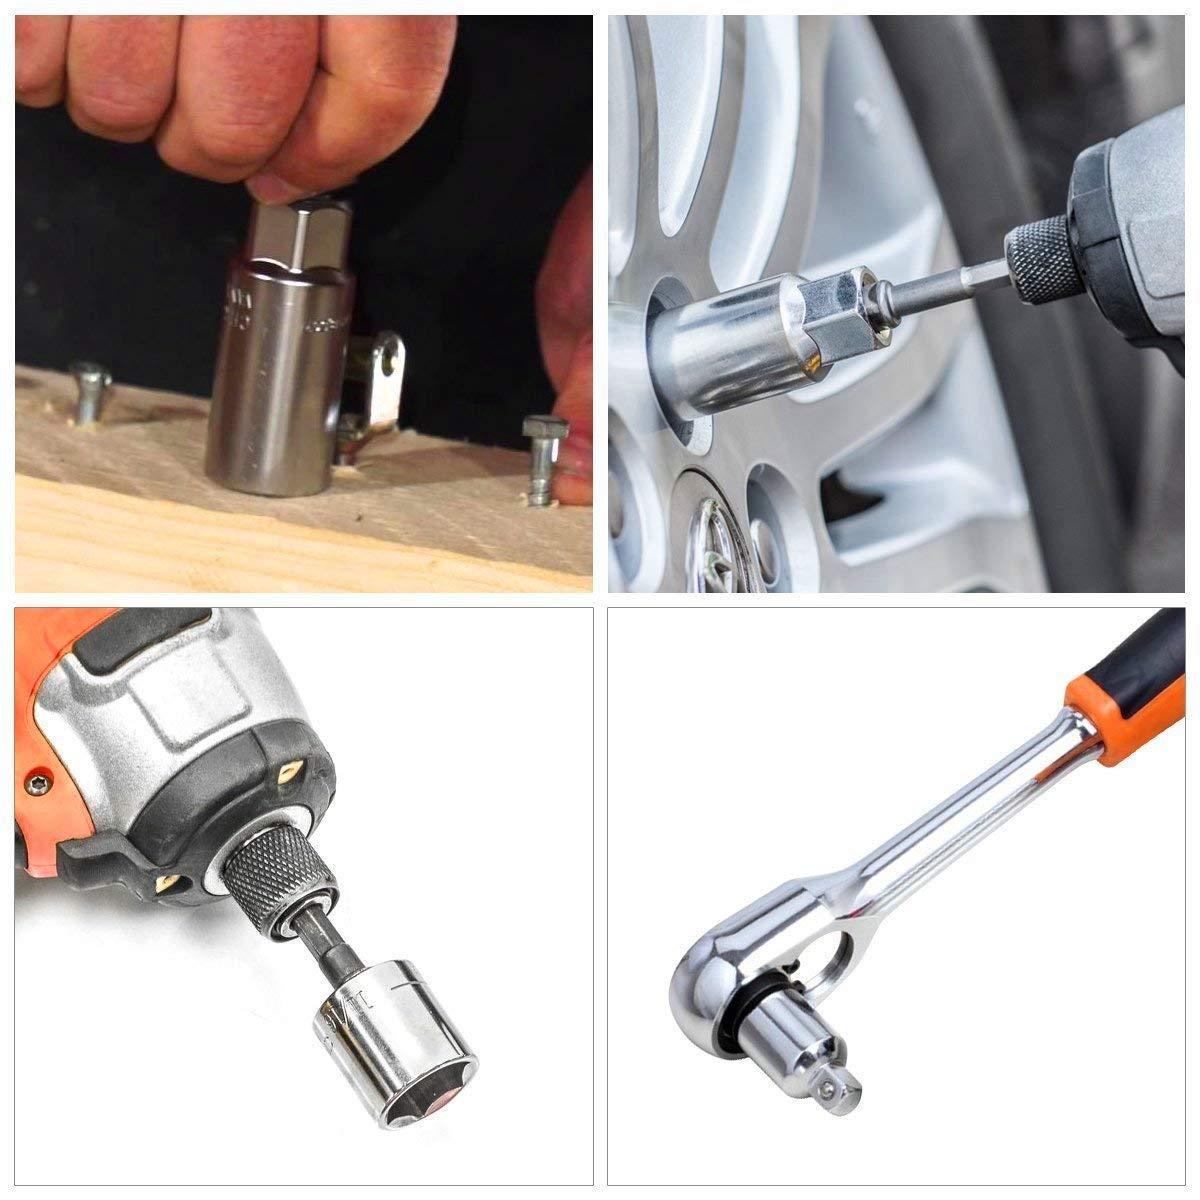 "Socket Adapter Converter Kit, 3Pcs 1/4 Hex Shank to 1/4"" 3/8"" 1/2"" Impact Driver Drill Power Bits and 4Pcs 1/4 3/8 1/2 Drive Socket Adapter Converter Reducer Air Impact Craftsman Socket Wrench Adapter"